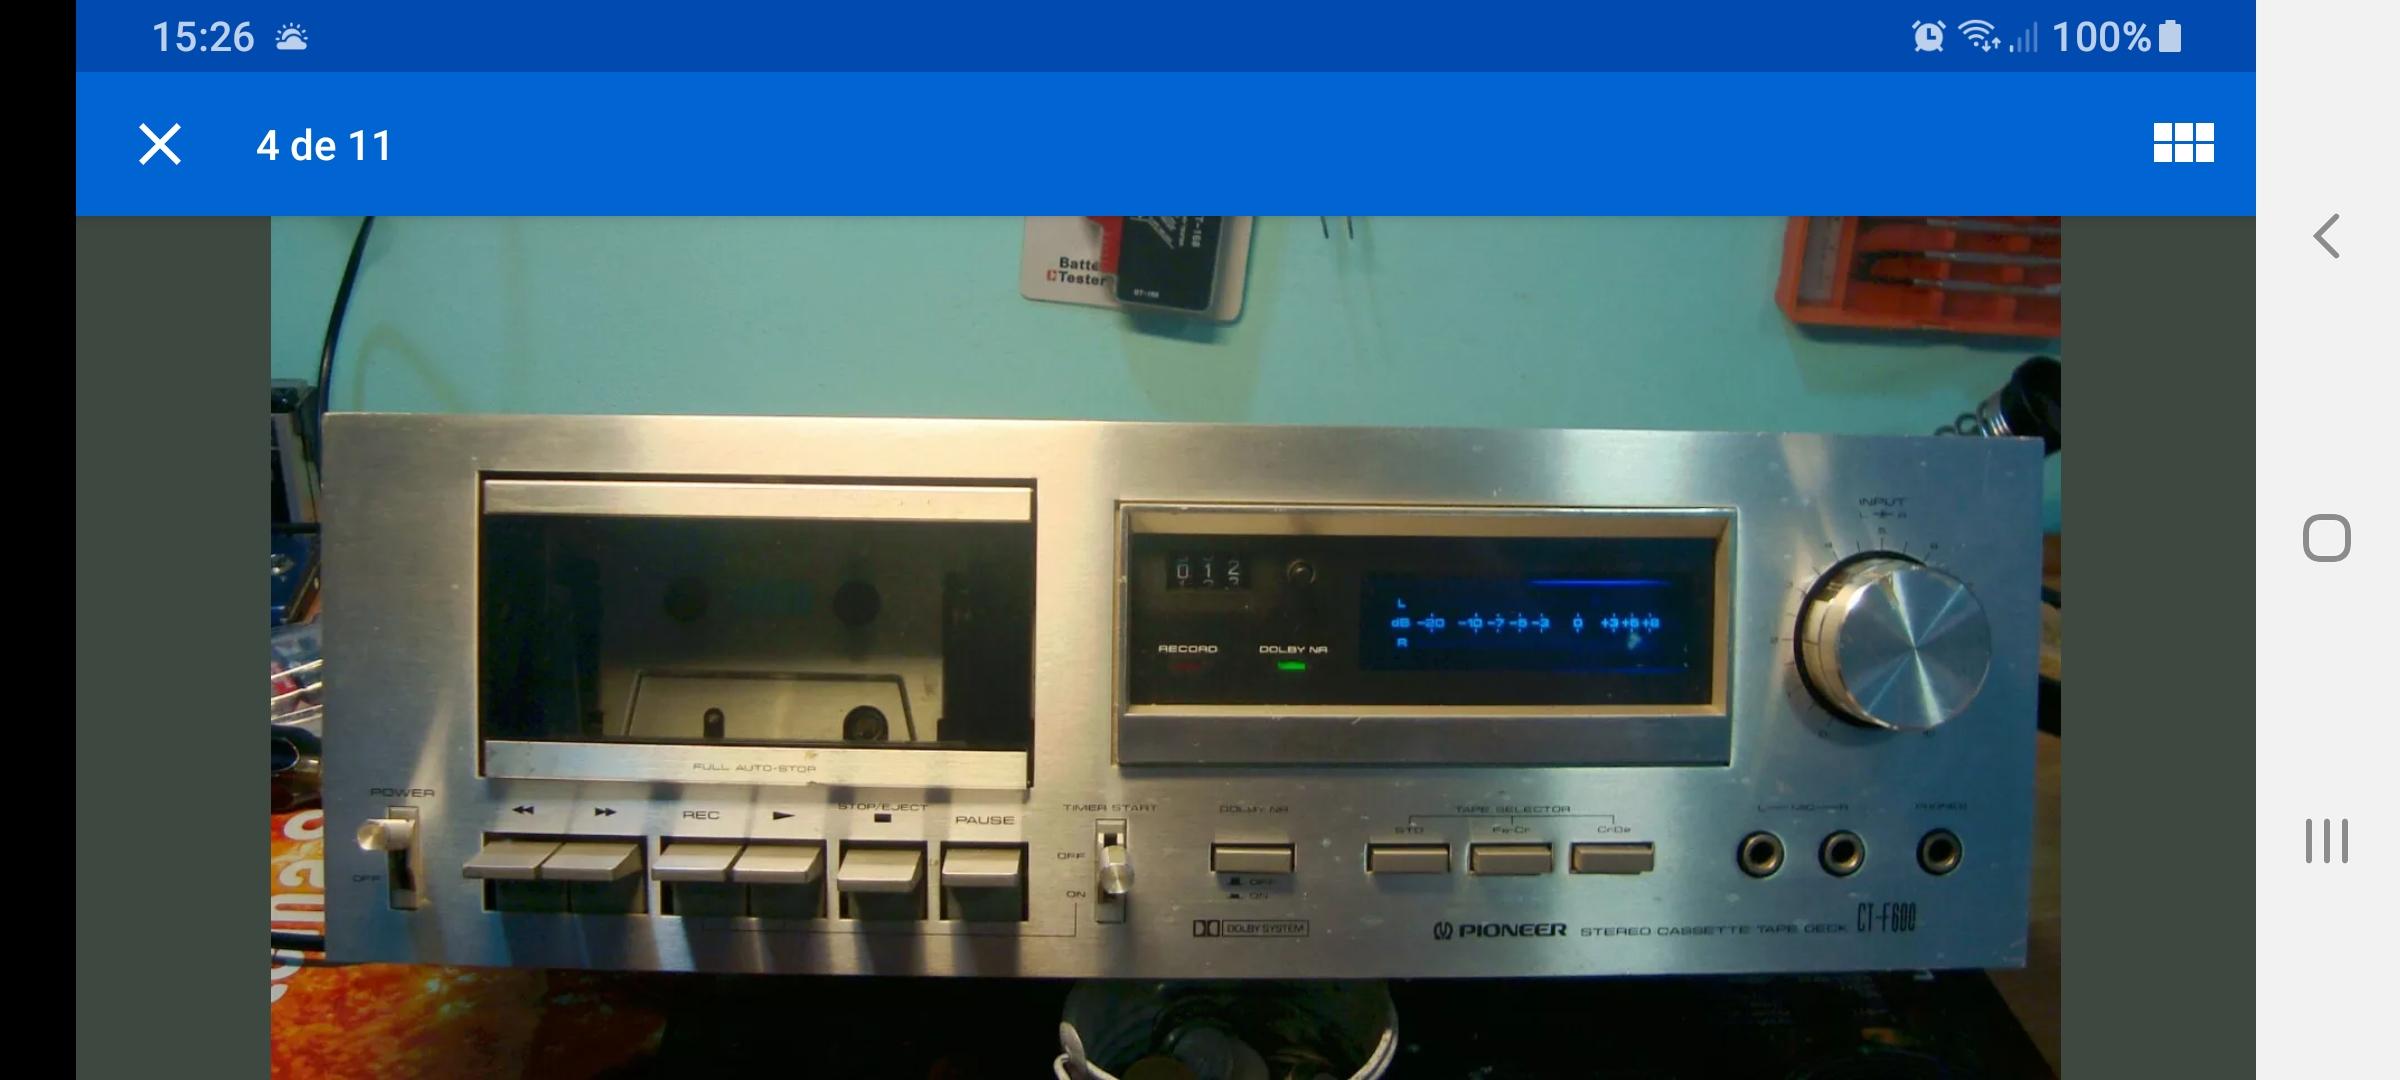 Pletina Pioneer CT-F600 Screenshot-20200125-152624-e-Bay